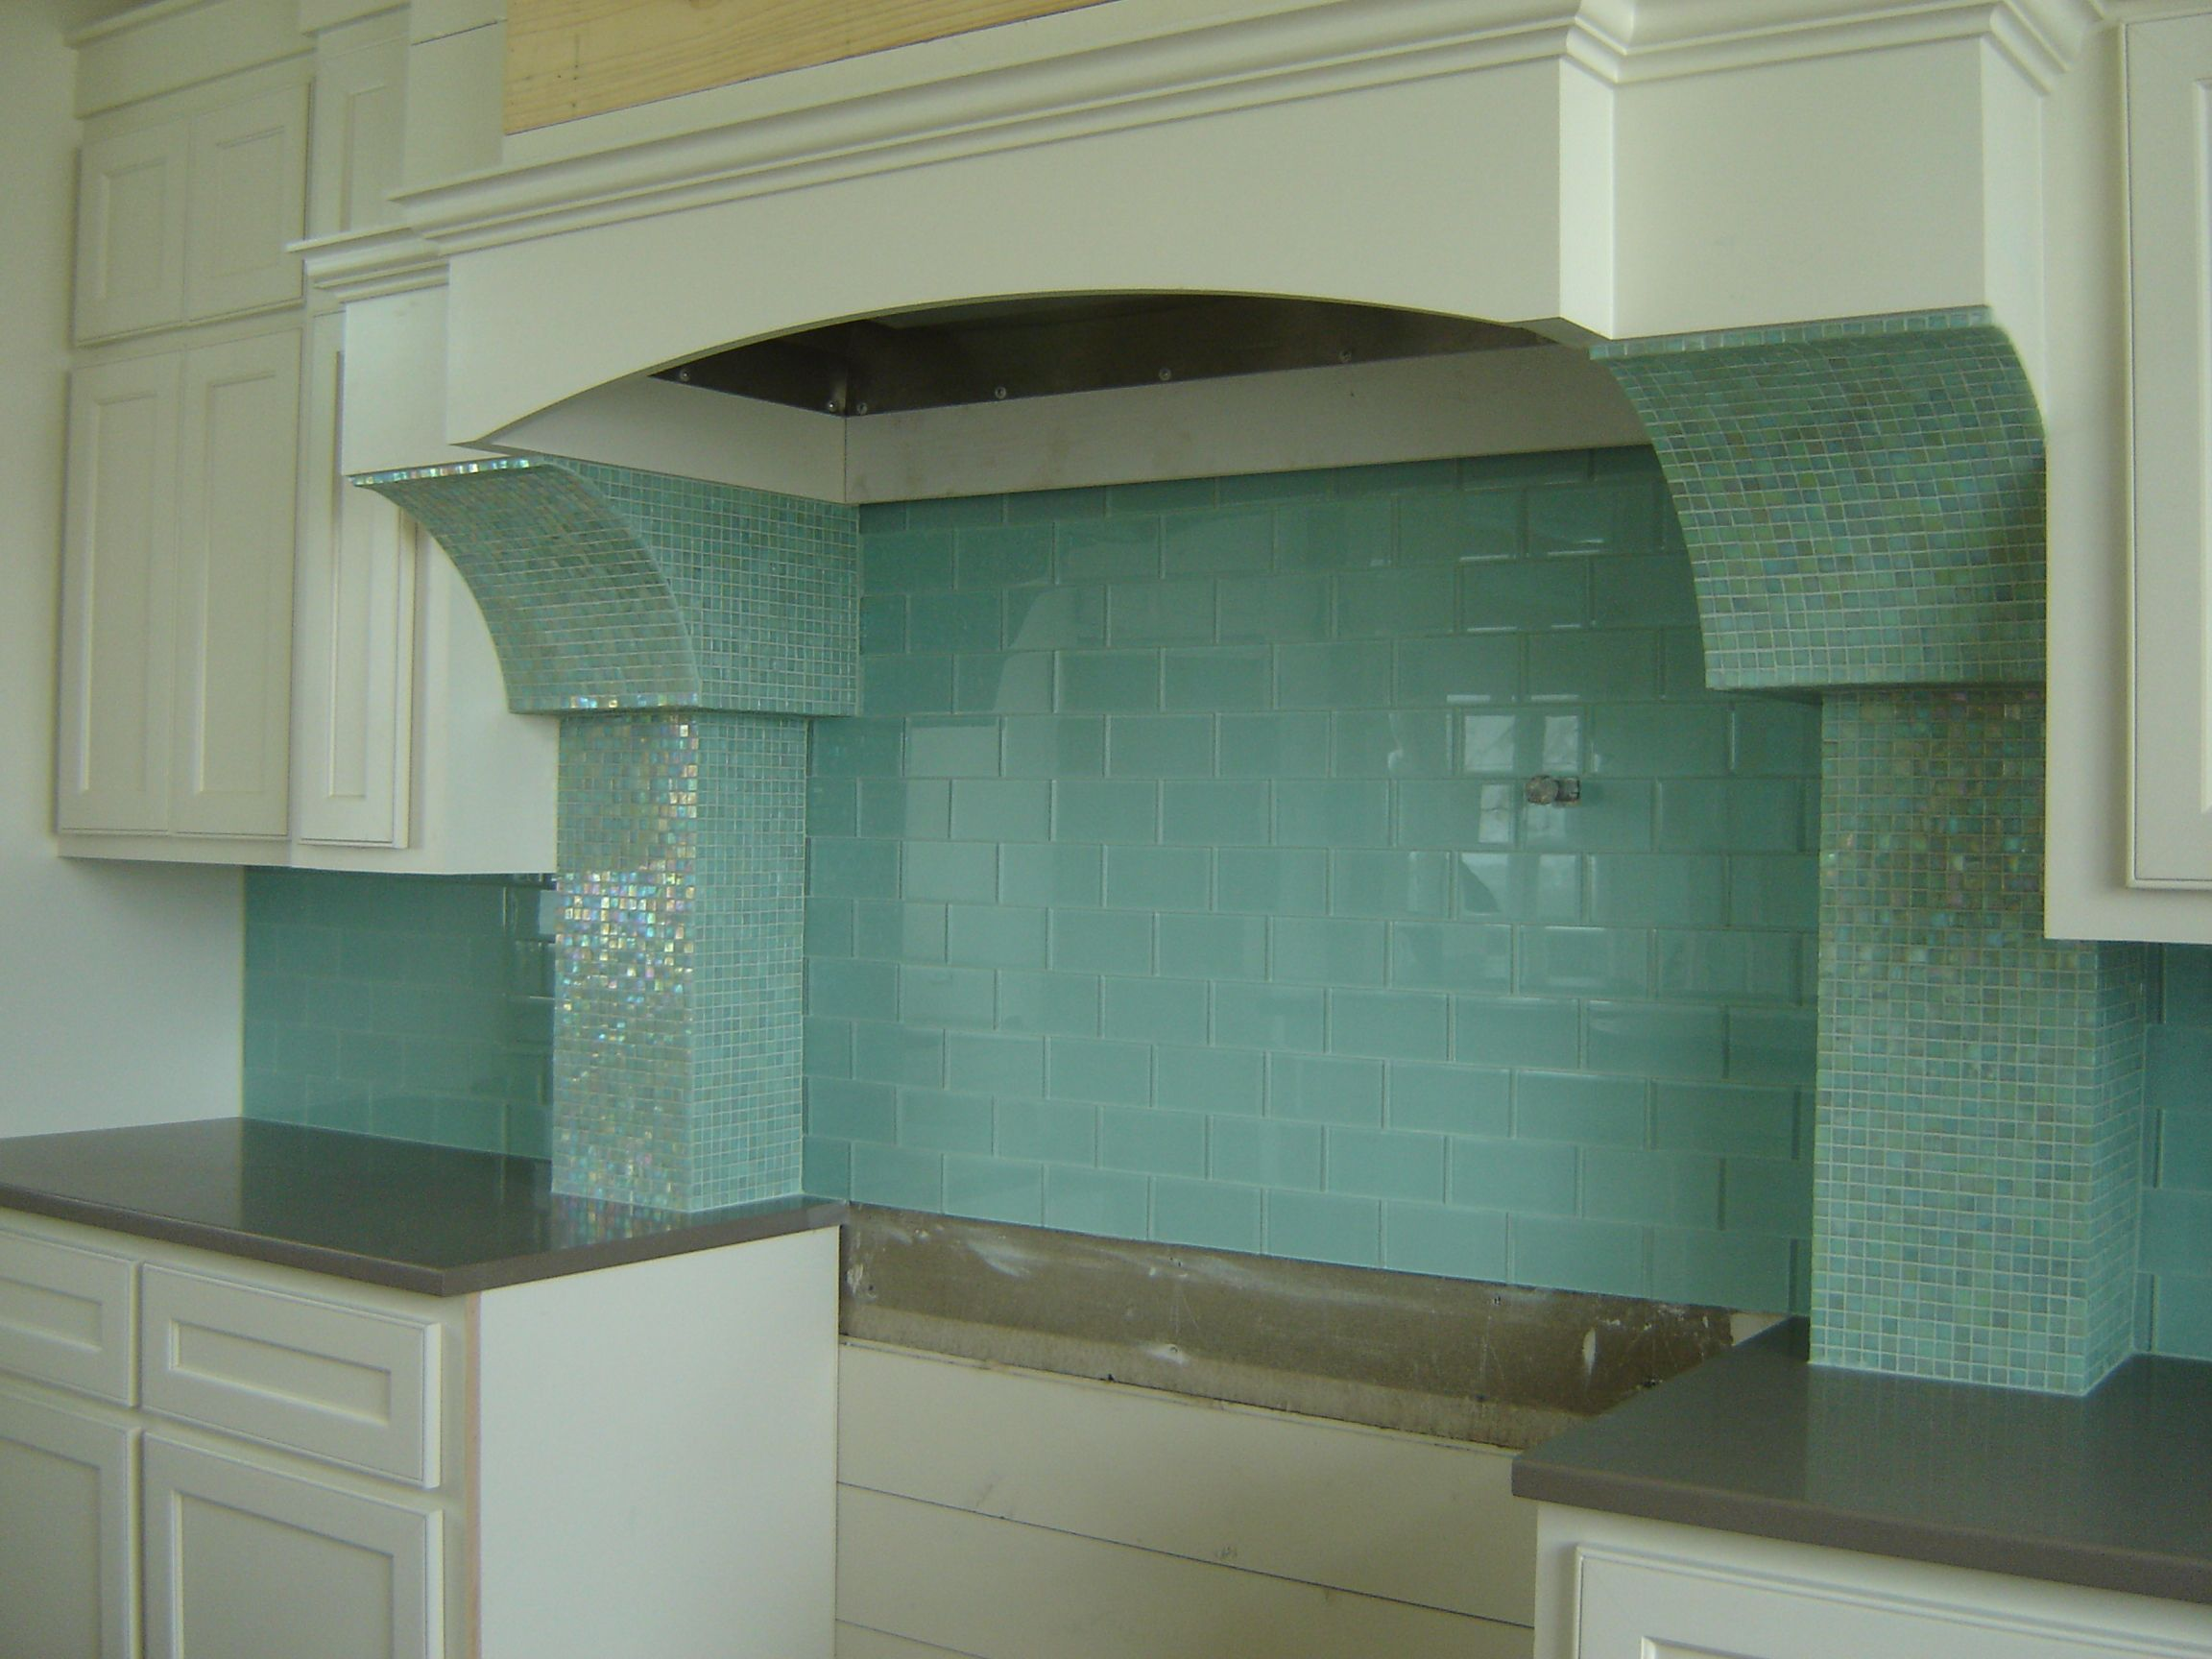 Surf Glass Subway Tile | Subway tile backsplash, Subway tiles and ...